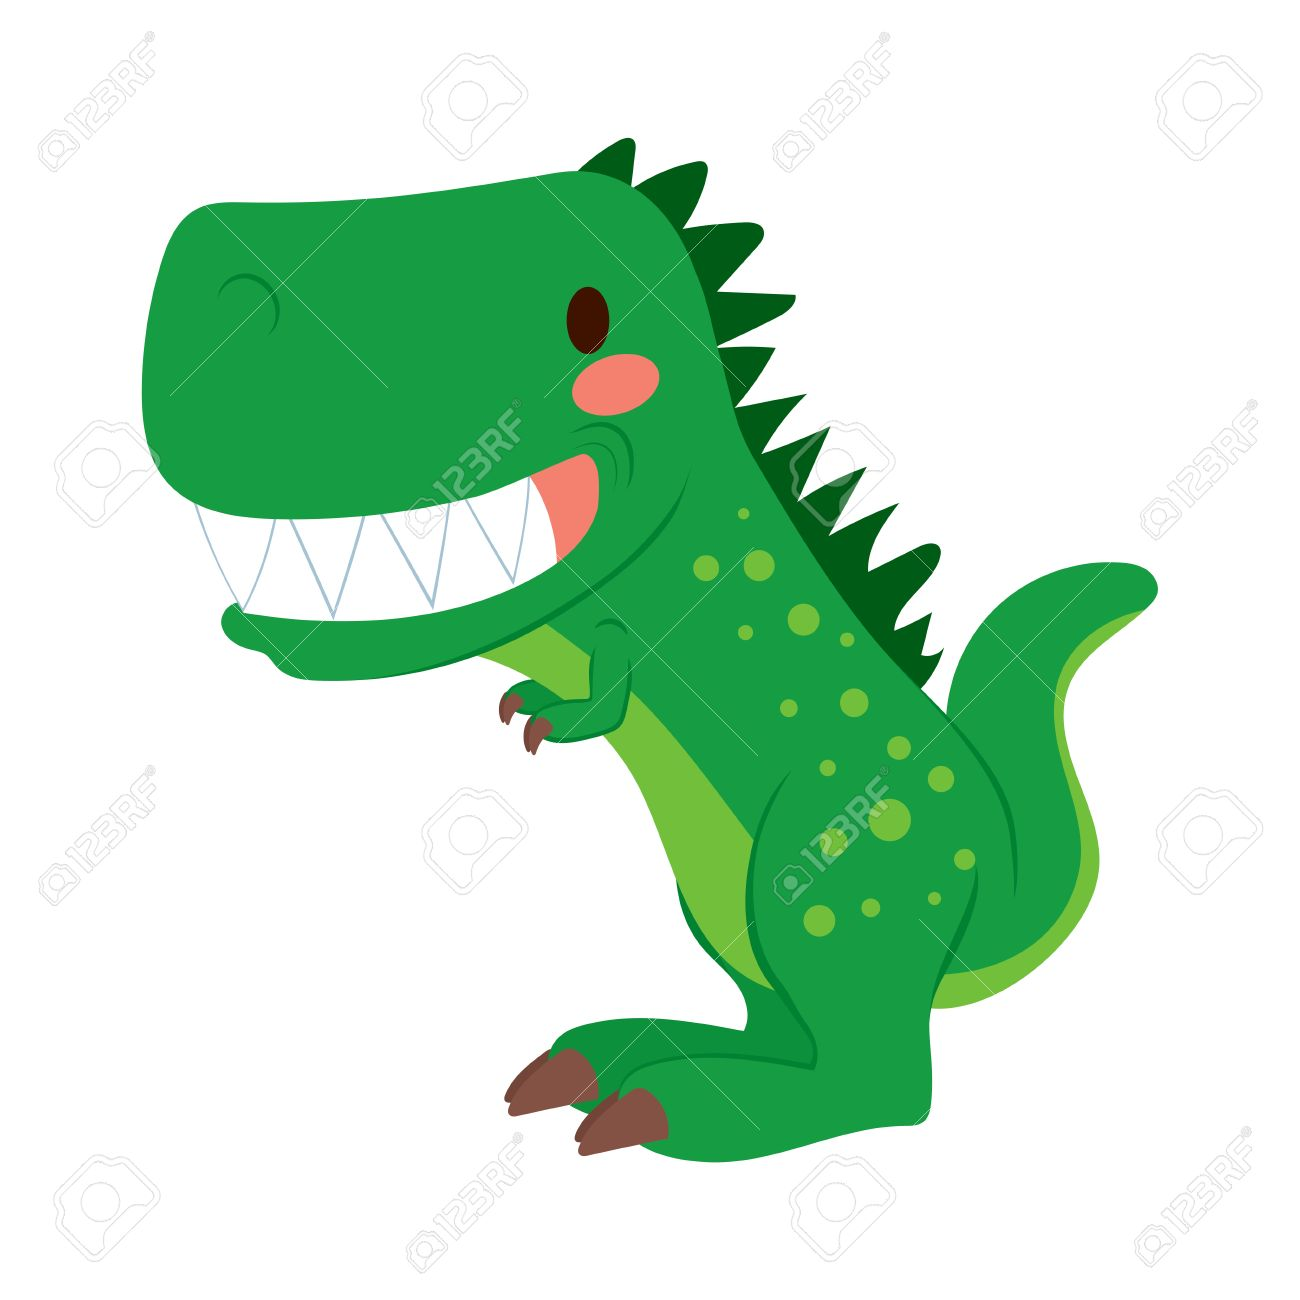 funny green cartoon t rex dinosaur toy showing teeth royalty free